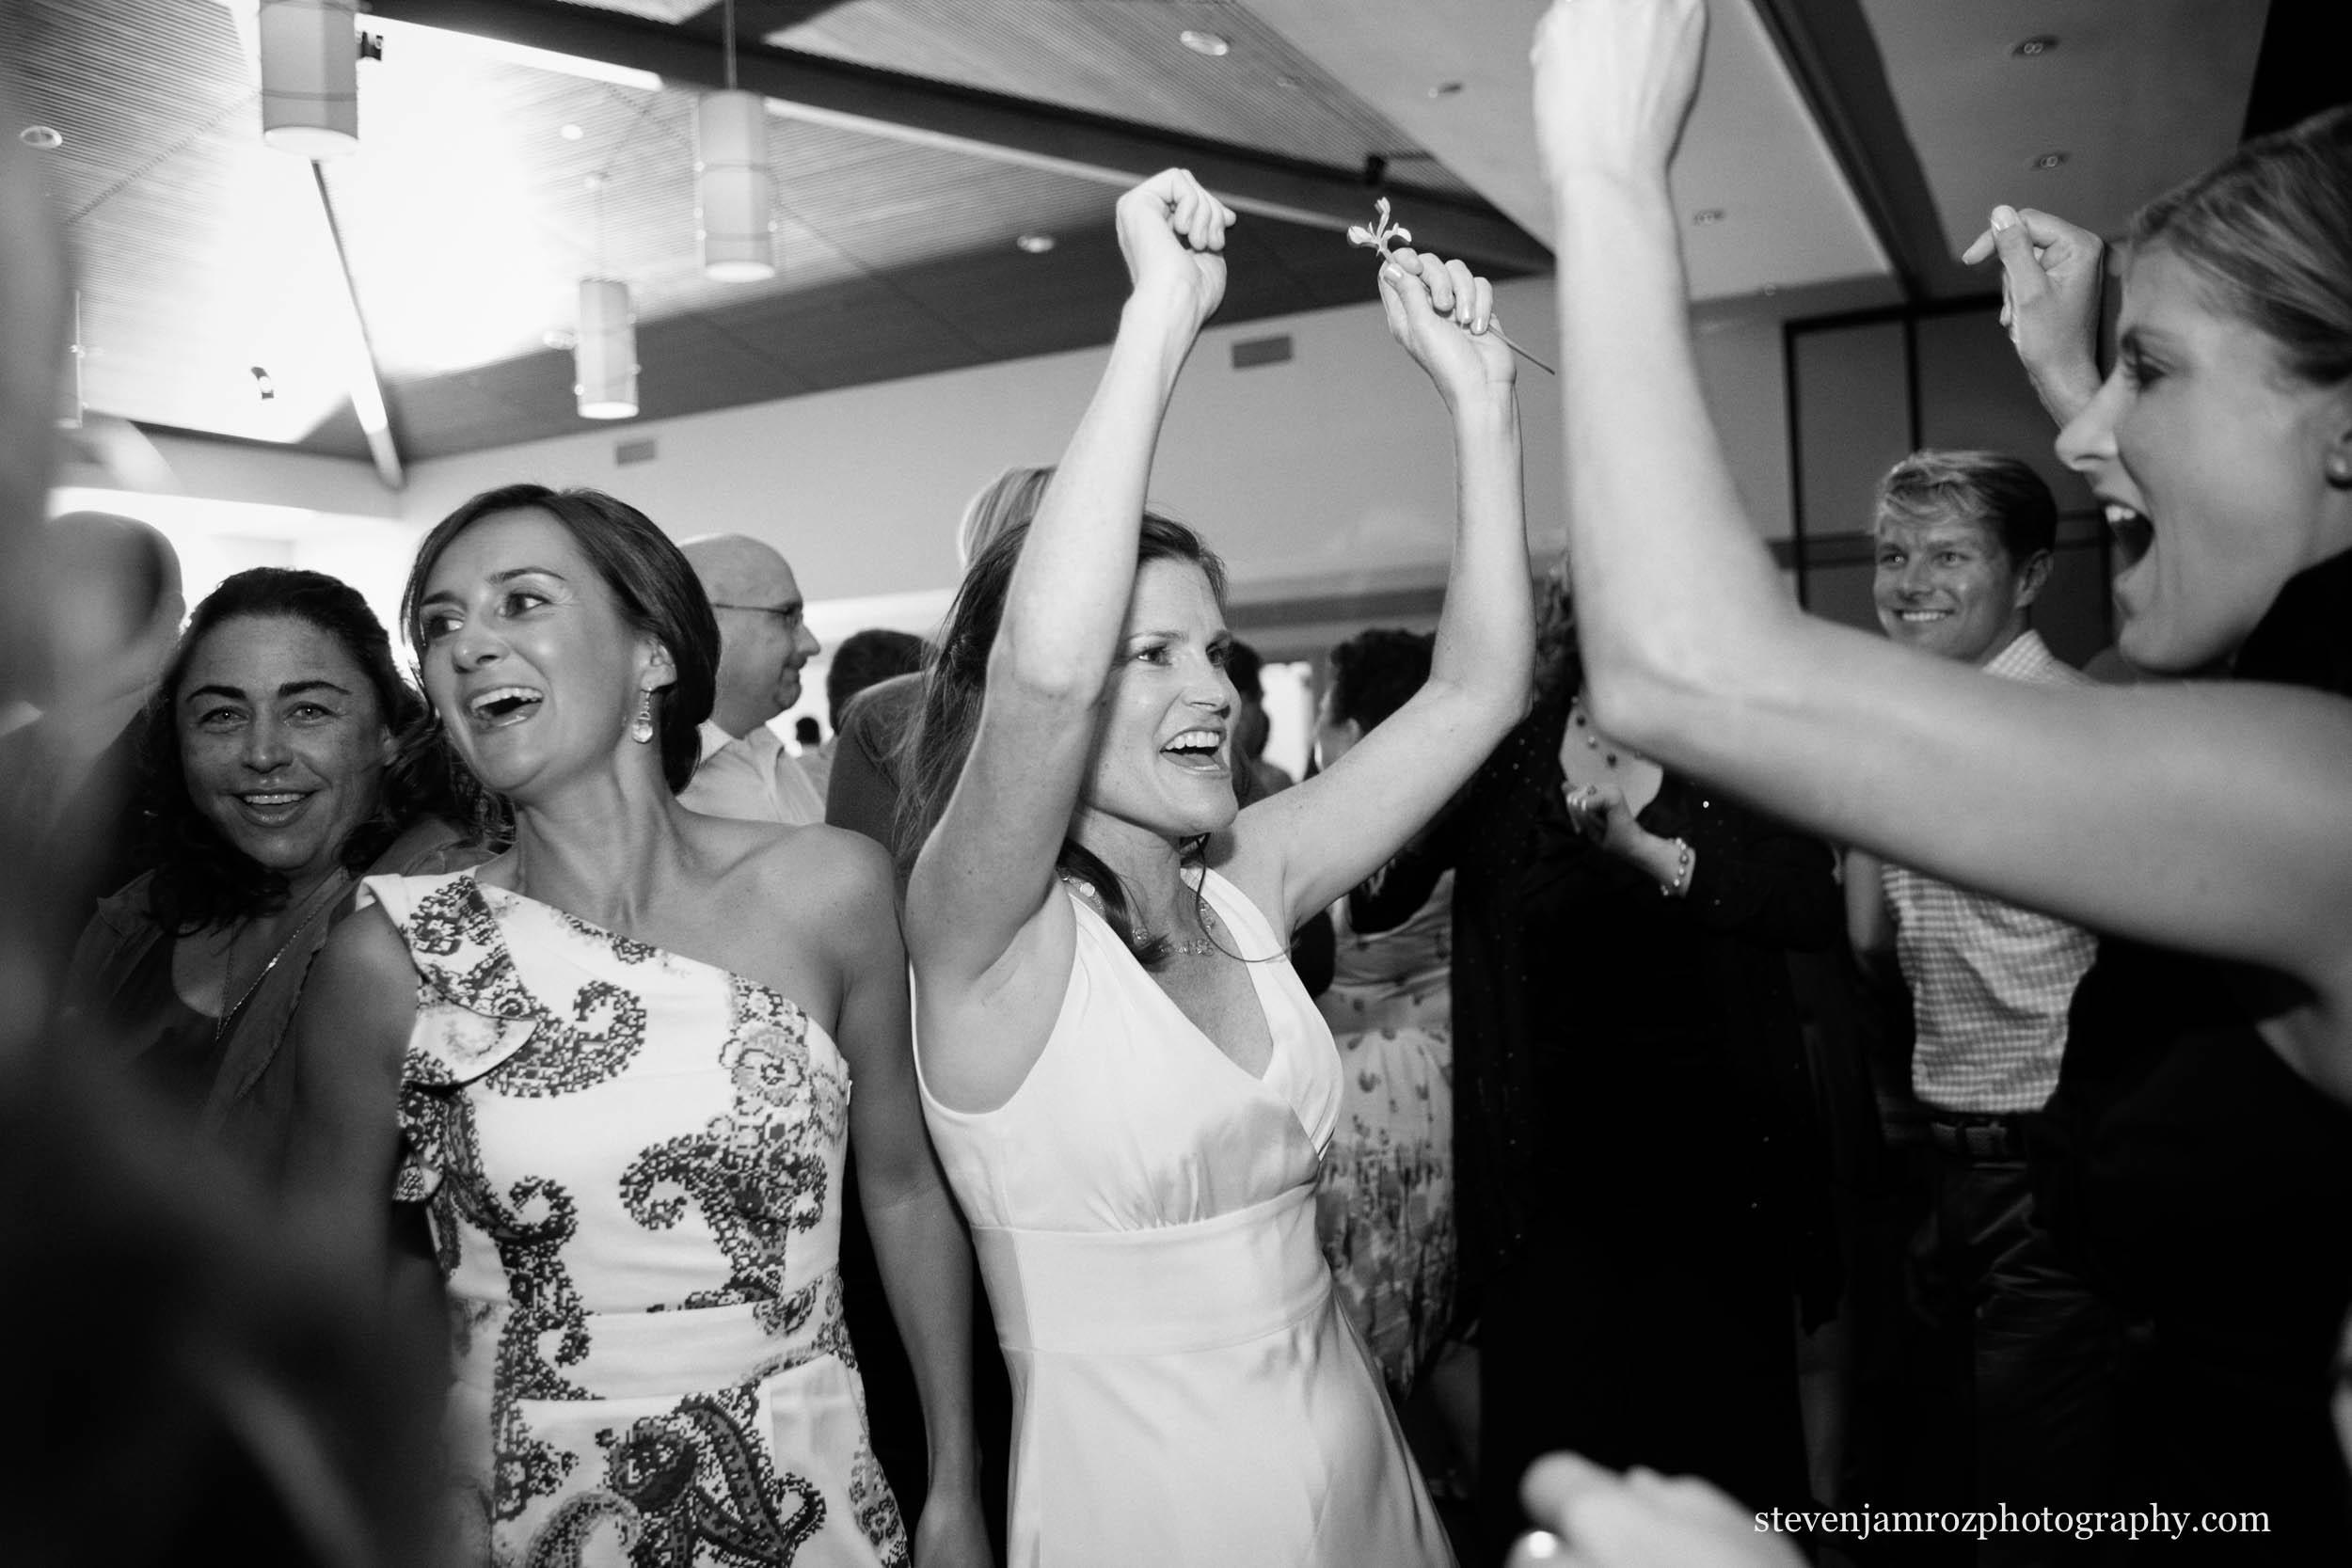 party-wedding-dancing-photographers-steven-jamroz-photography-0101.jpg